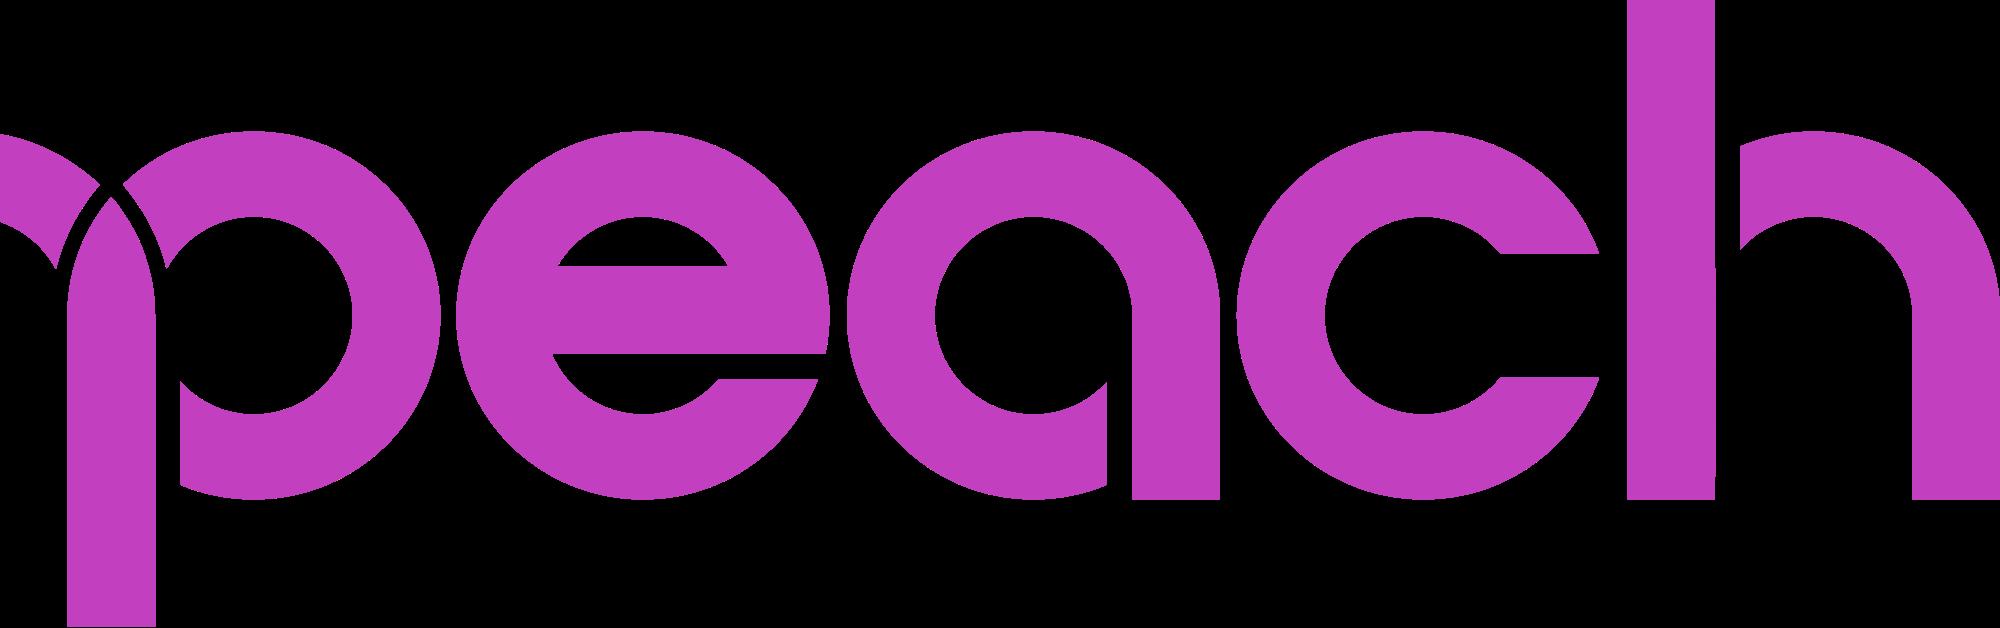 peachlogo